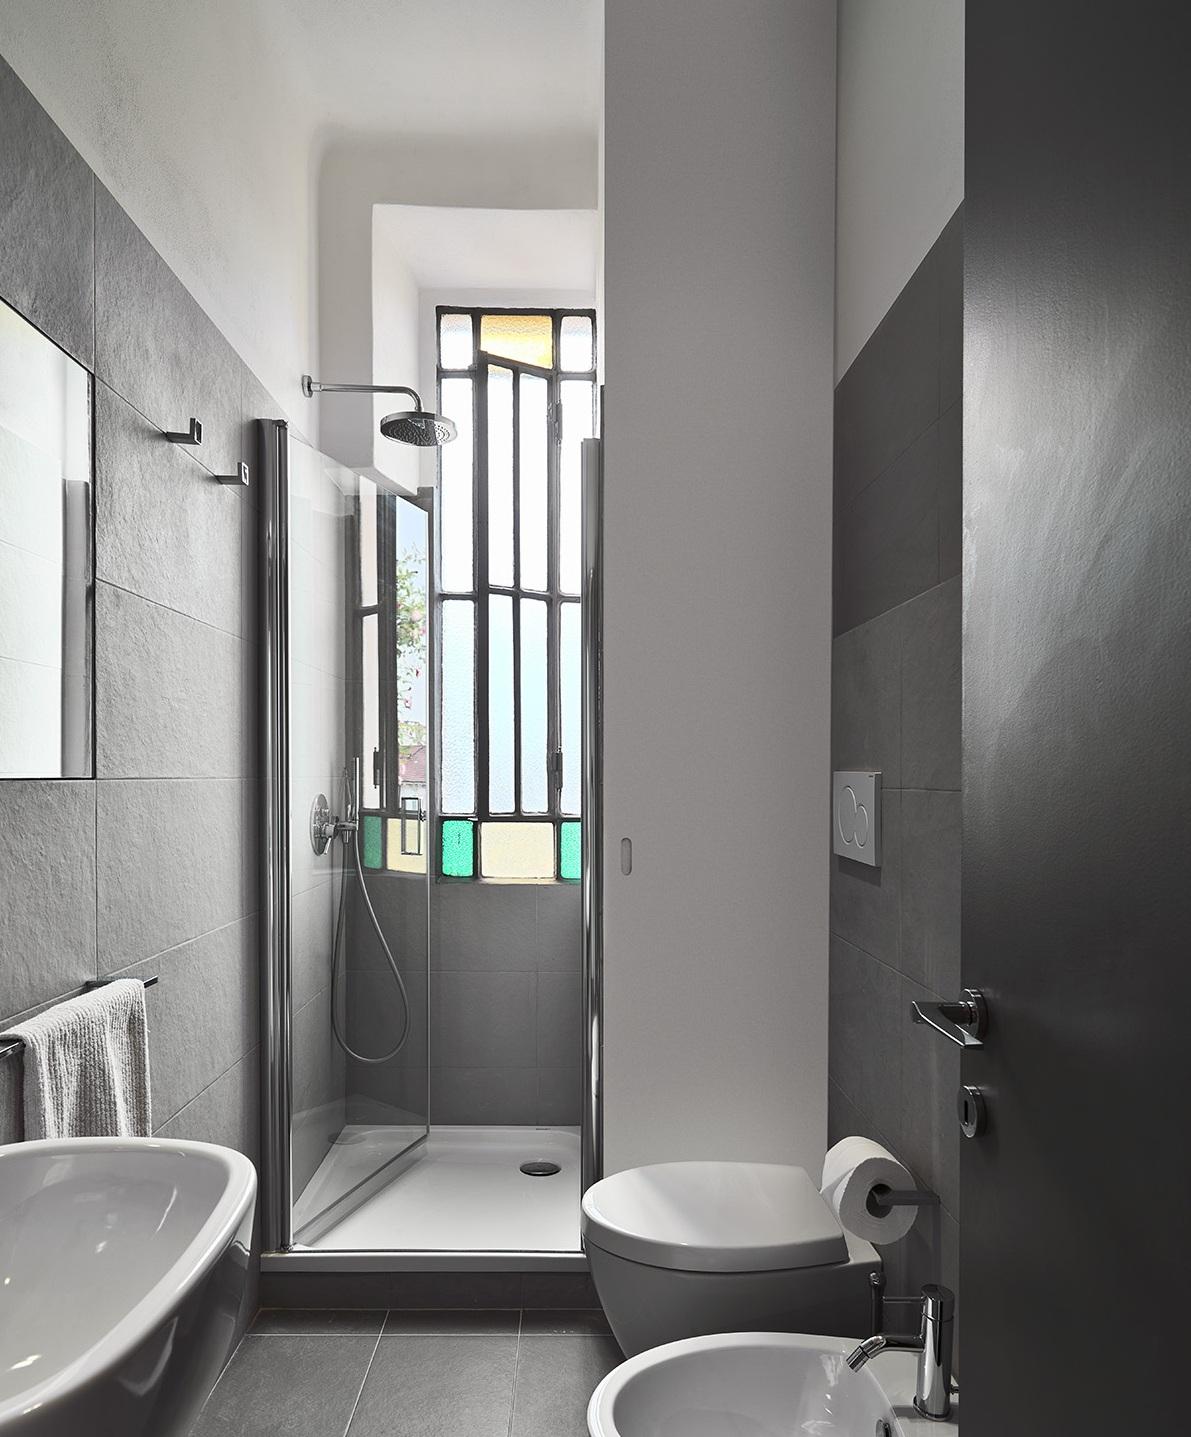 Assez Arredare case piccole: 40 mq di infinite possibilità! YE81